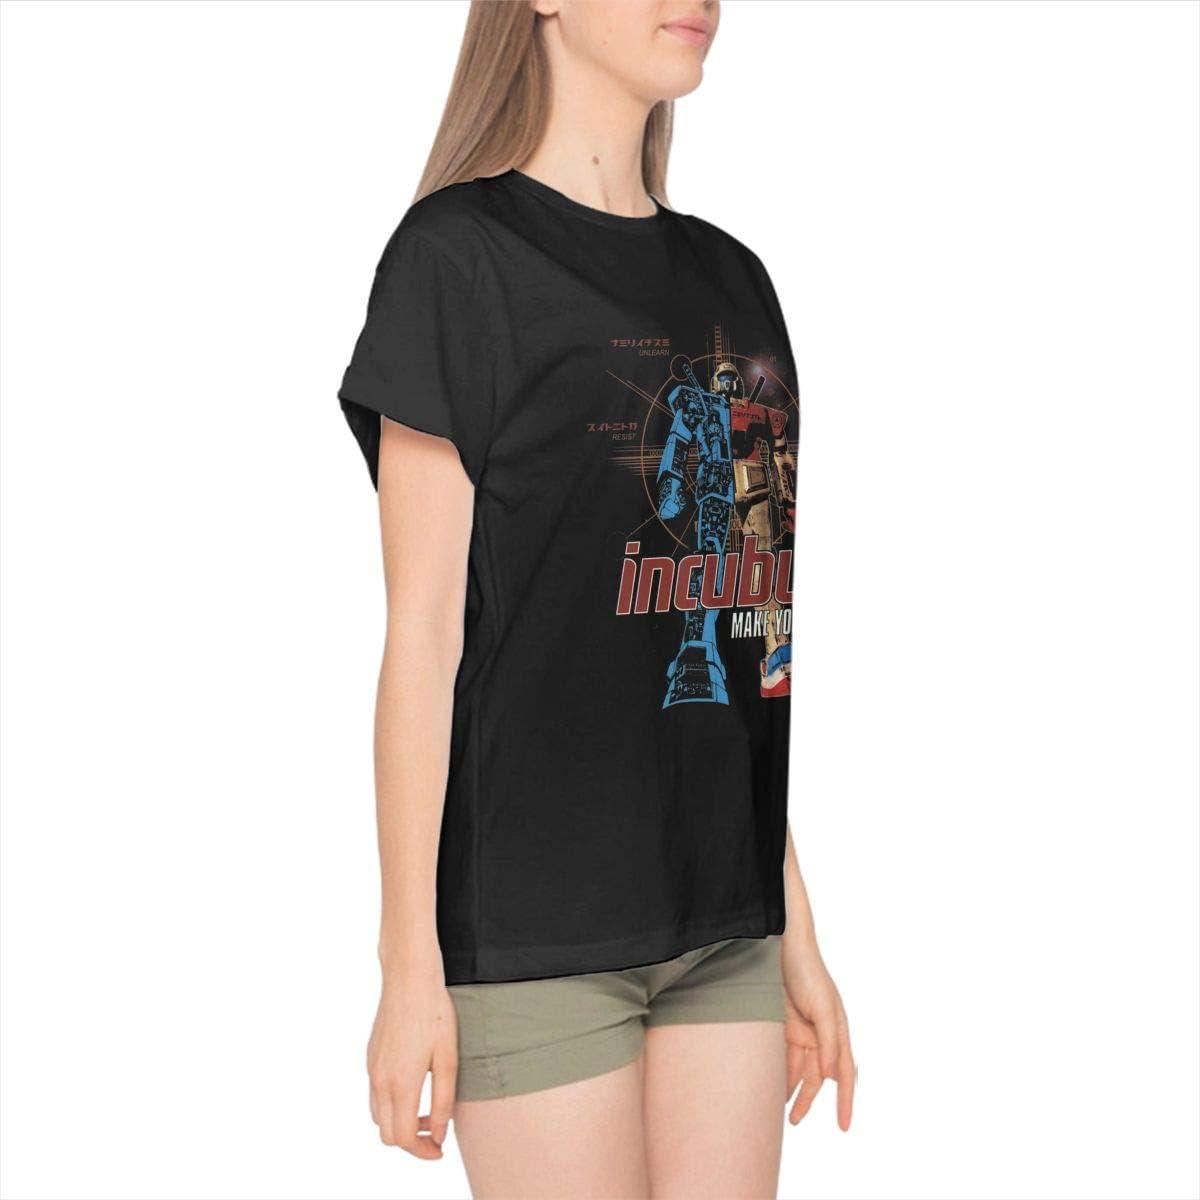 Incubus-Make Yourself Women Basic Cotton Short Sleeve Singer Music Band Shirt Black